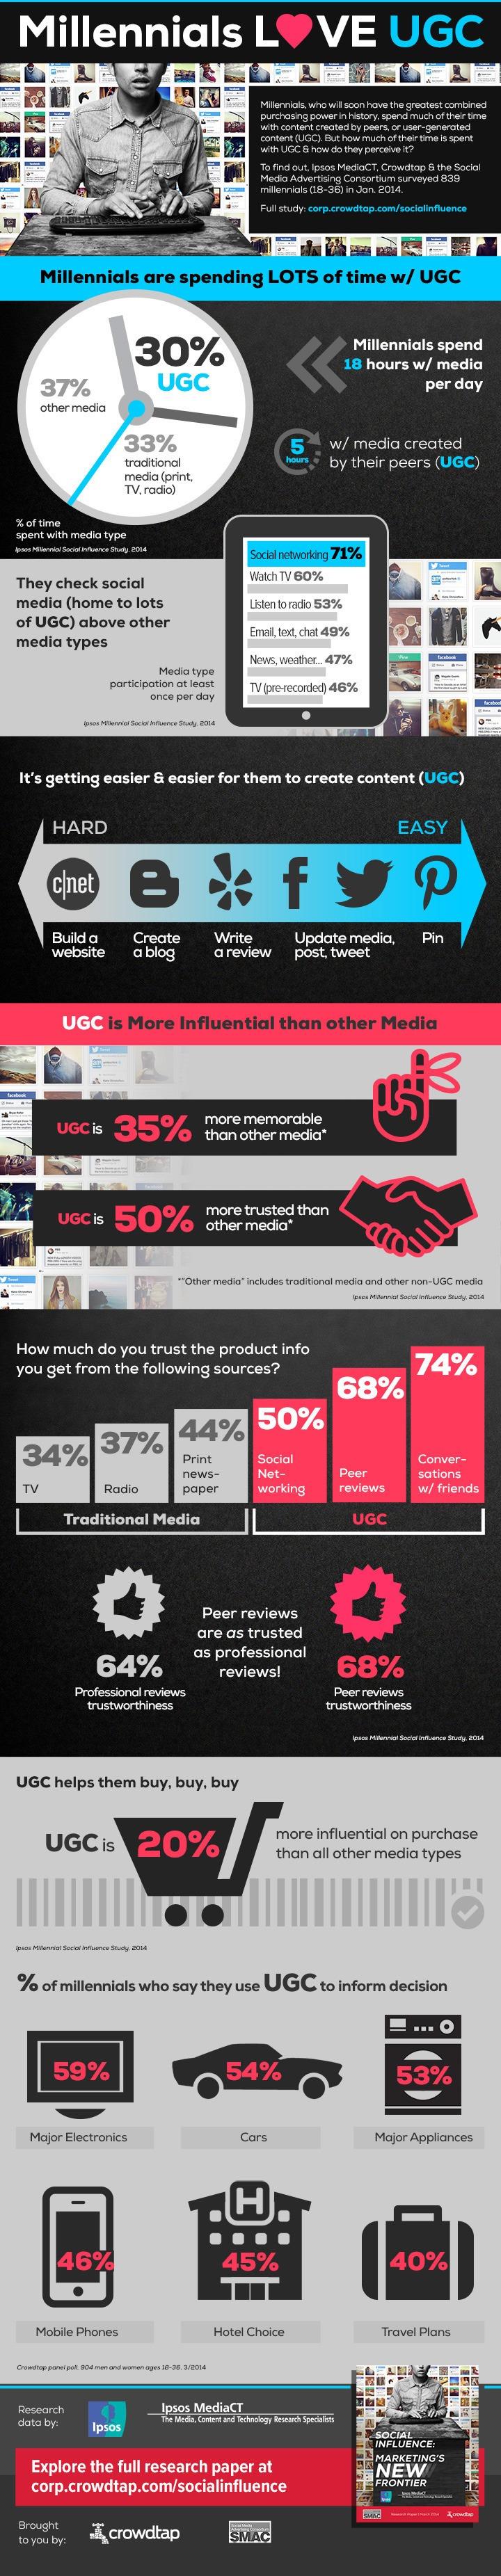 Millennials Marketing and UGC Infographic